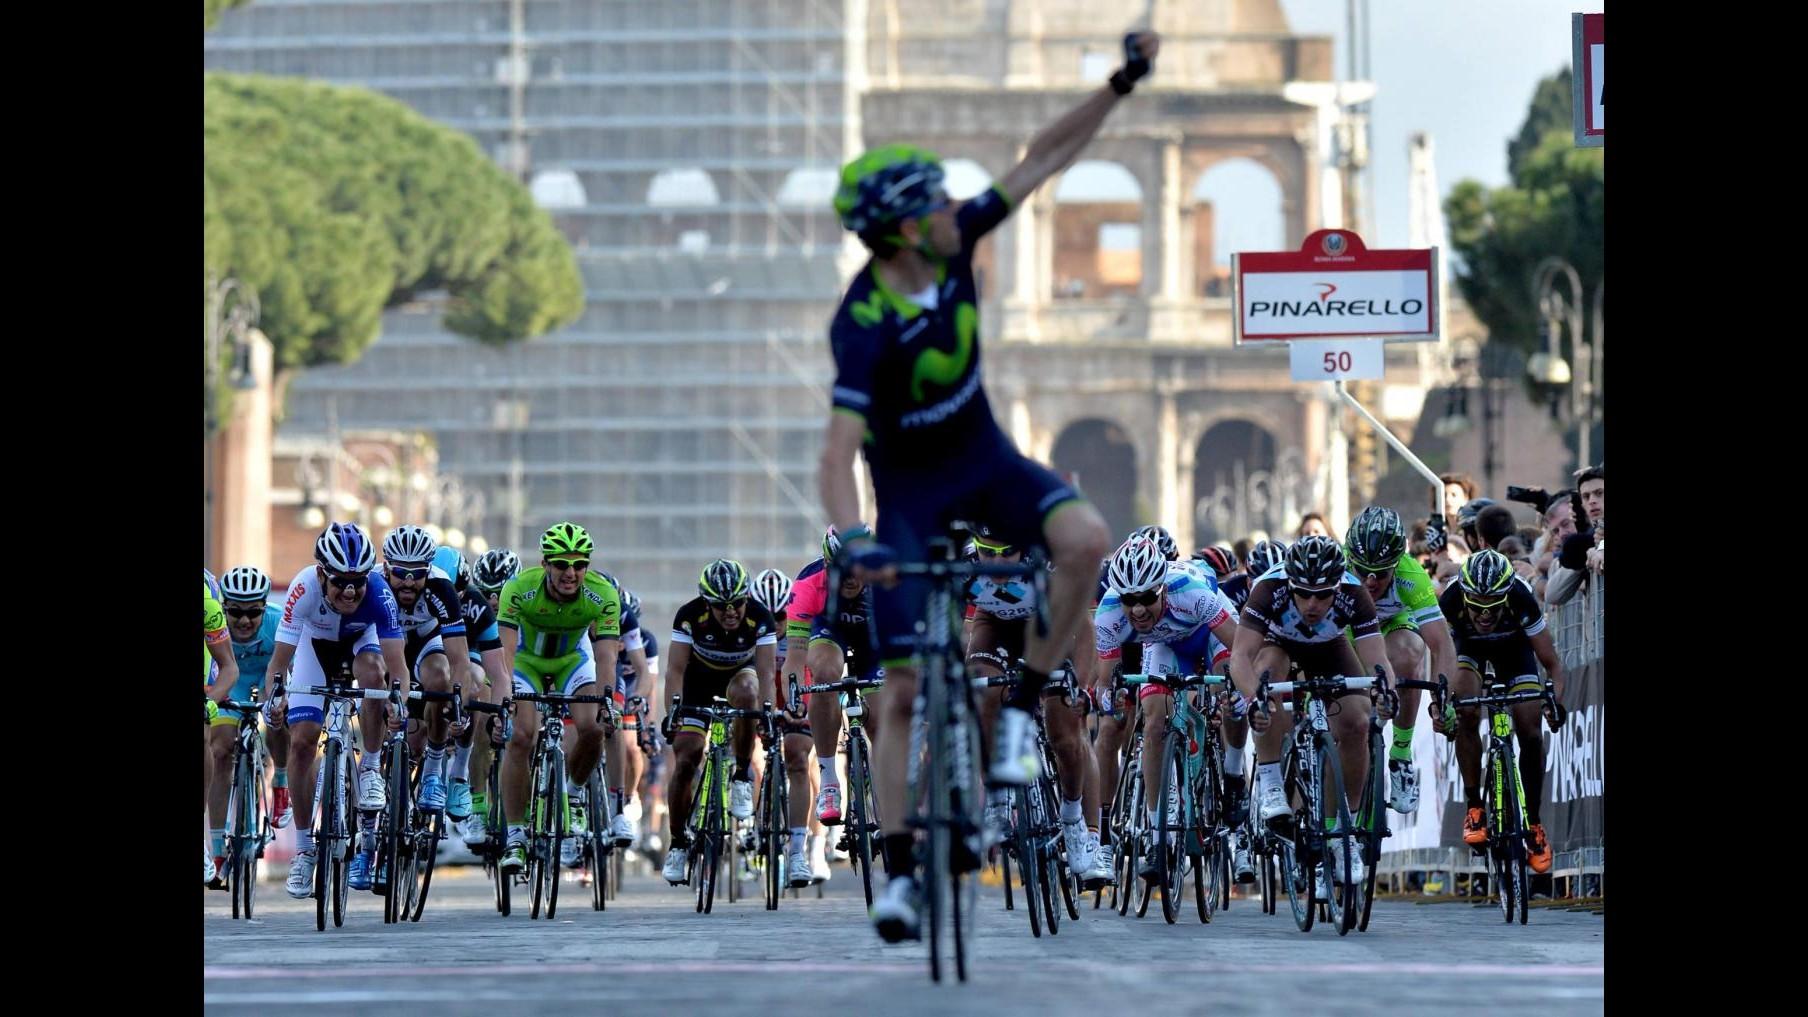 Ciclismo, lo spagnolo Valverde vince la Roma Maxima